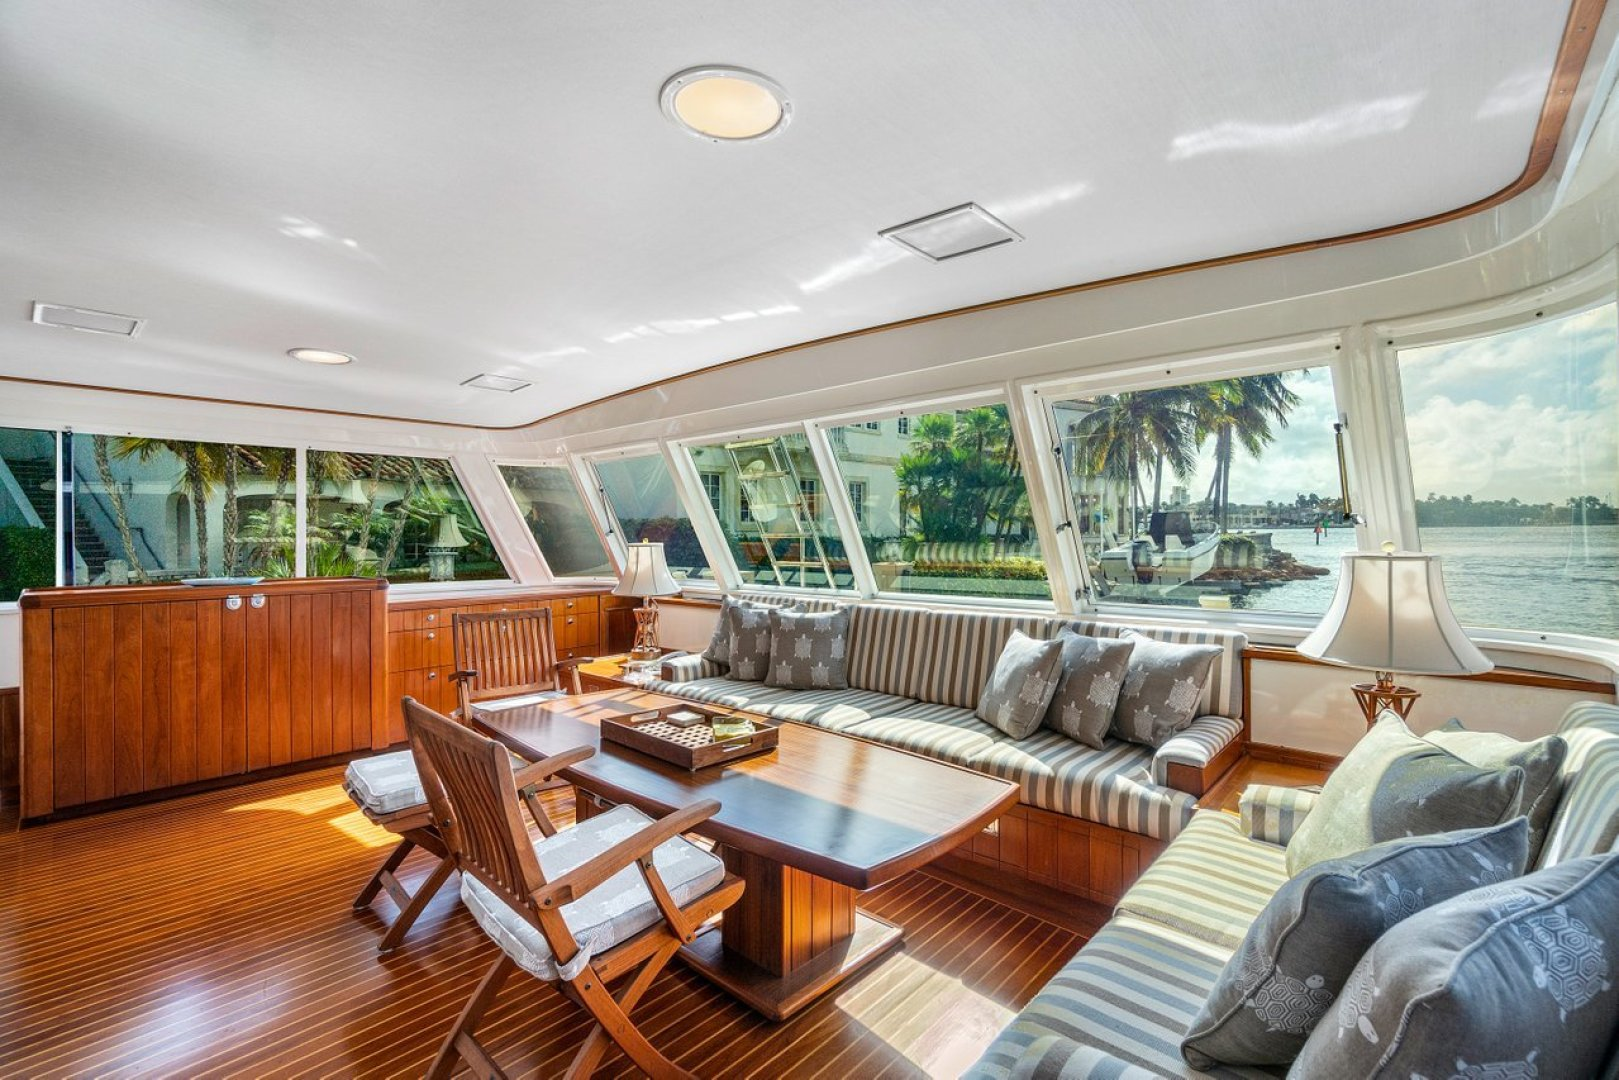 Feadship-Yacht Fisherman 1977-Impetuous Fort Lauderdale-Florida-United States-1575508 | Thumbnail